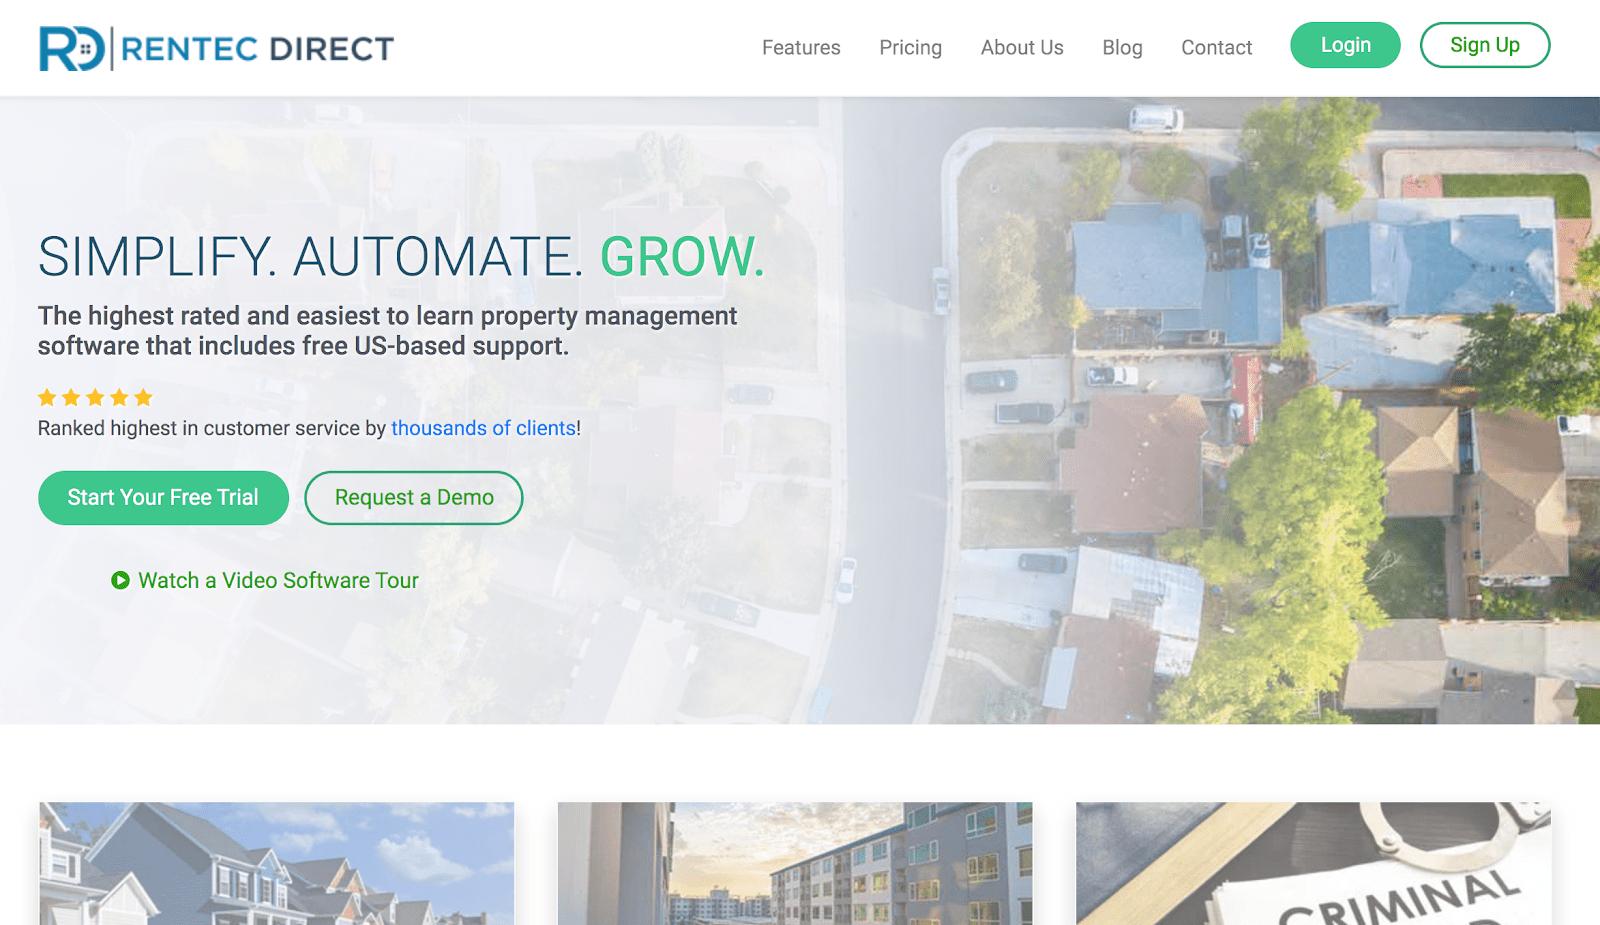 Rentec Direct Management software